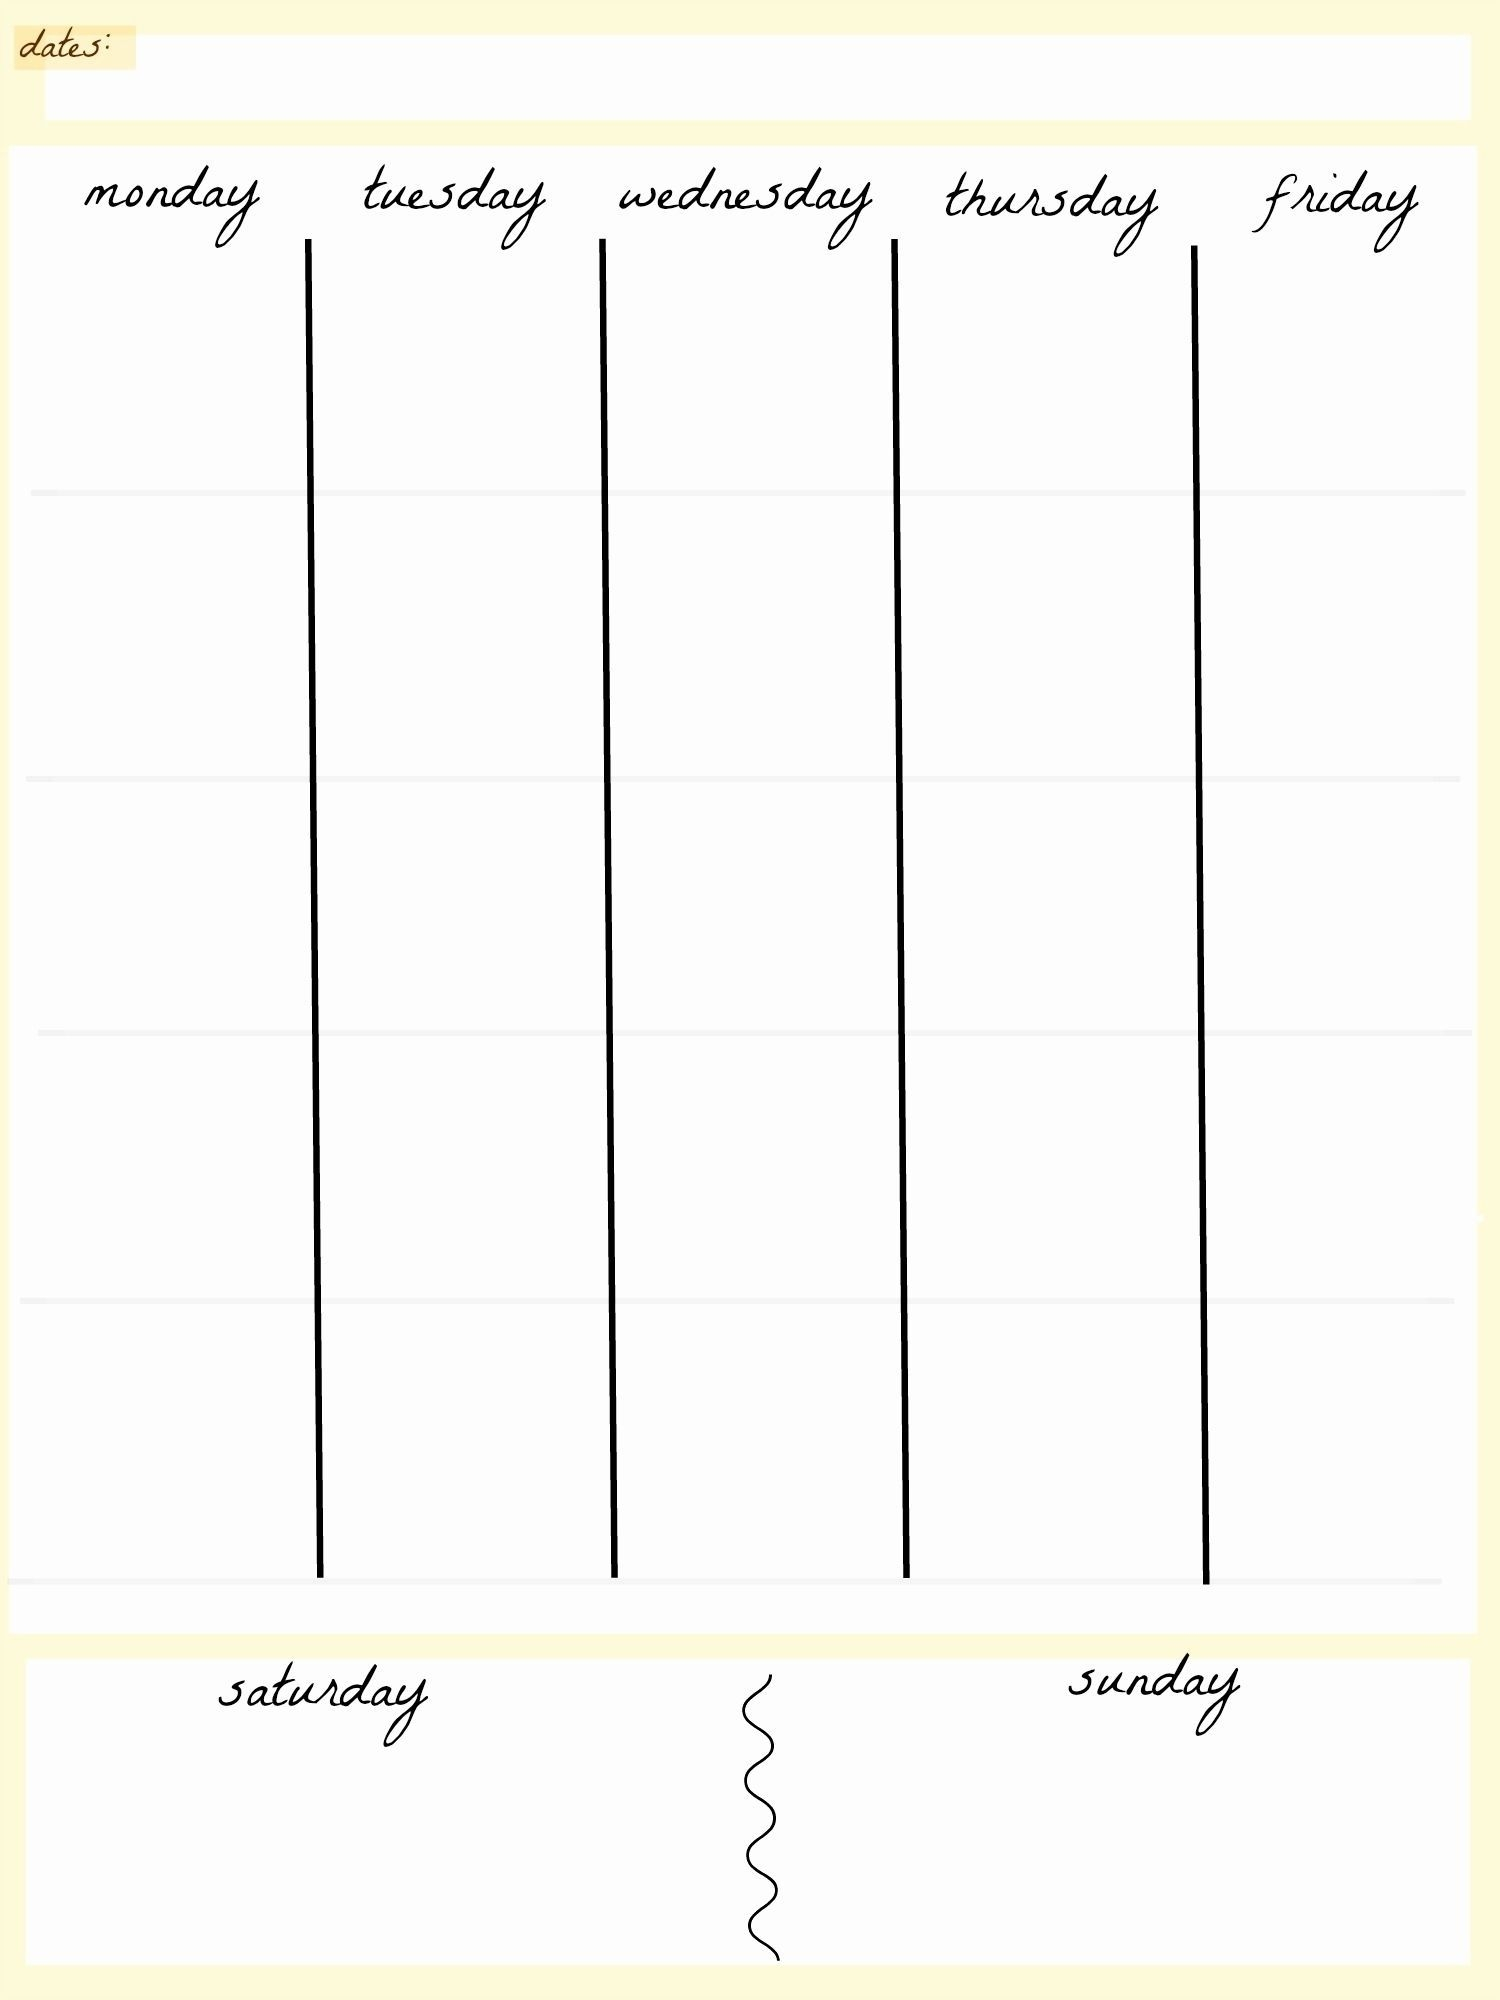 blank calendar 5 day week   blank calendar template dowload